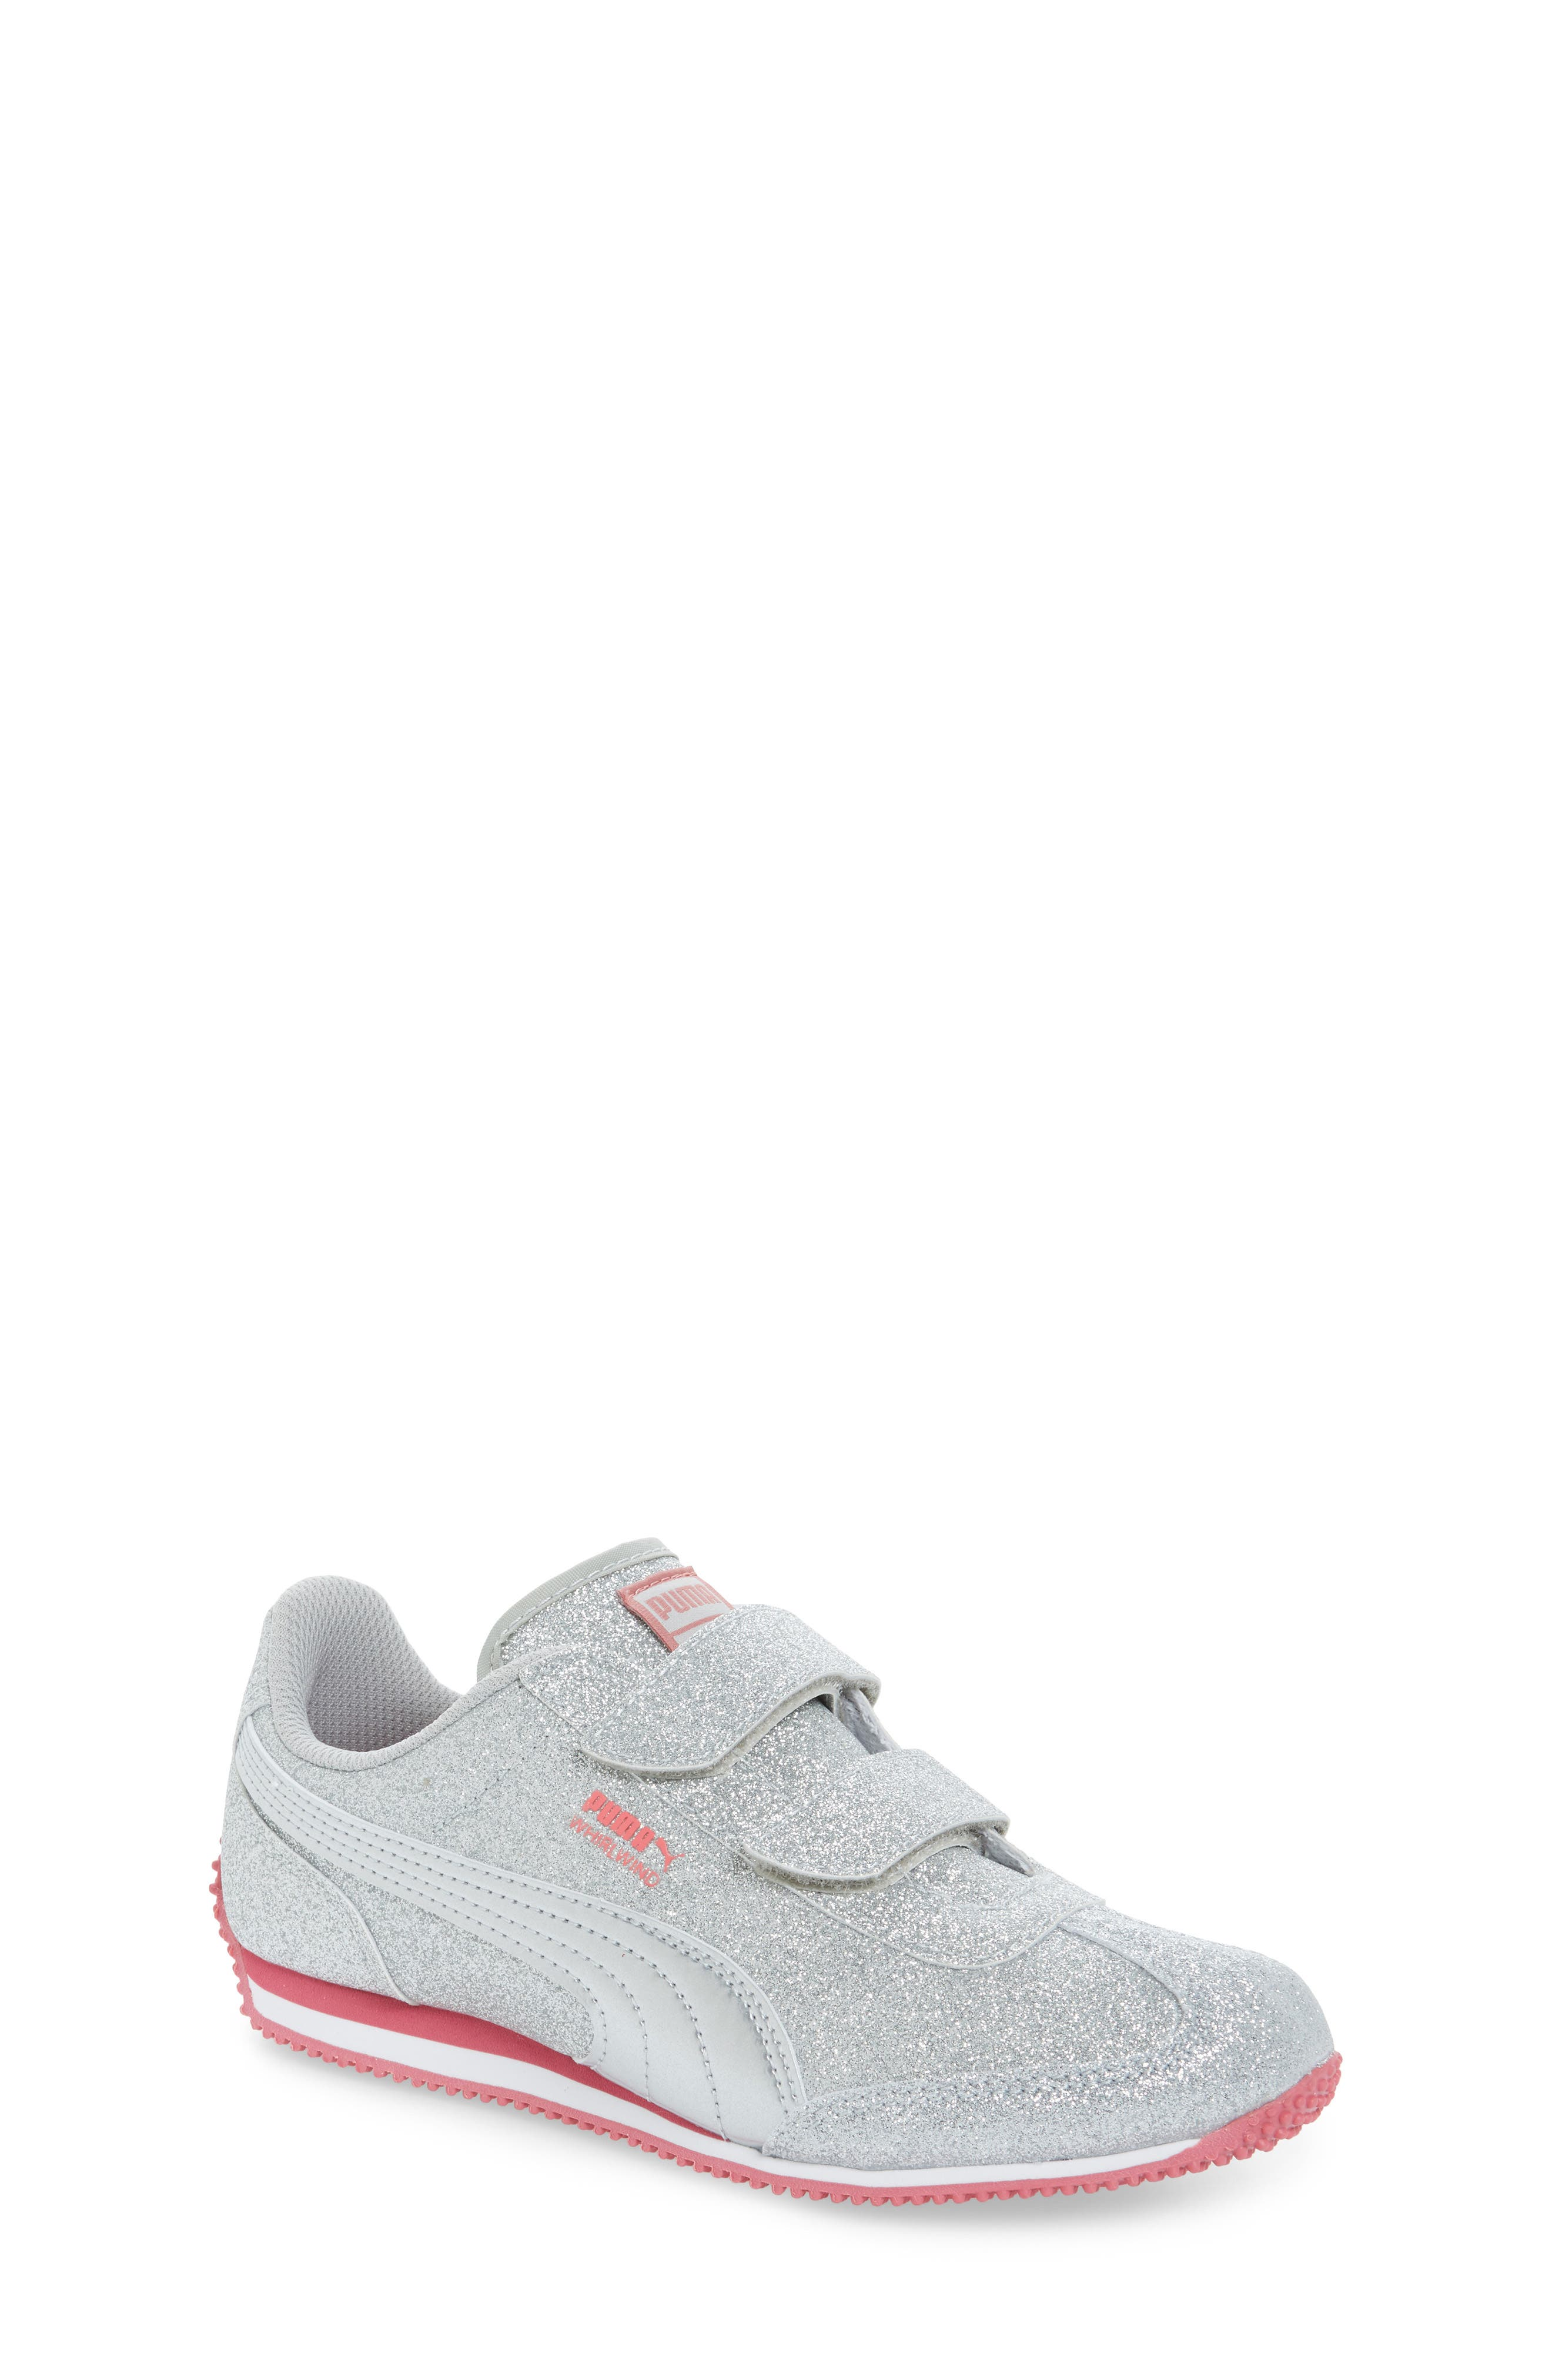 Whirlwind Glitz Sneaker,                         Main,                         color, 040